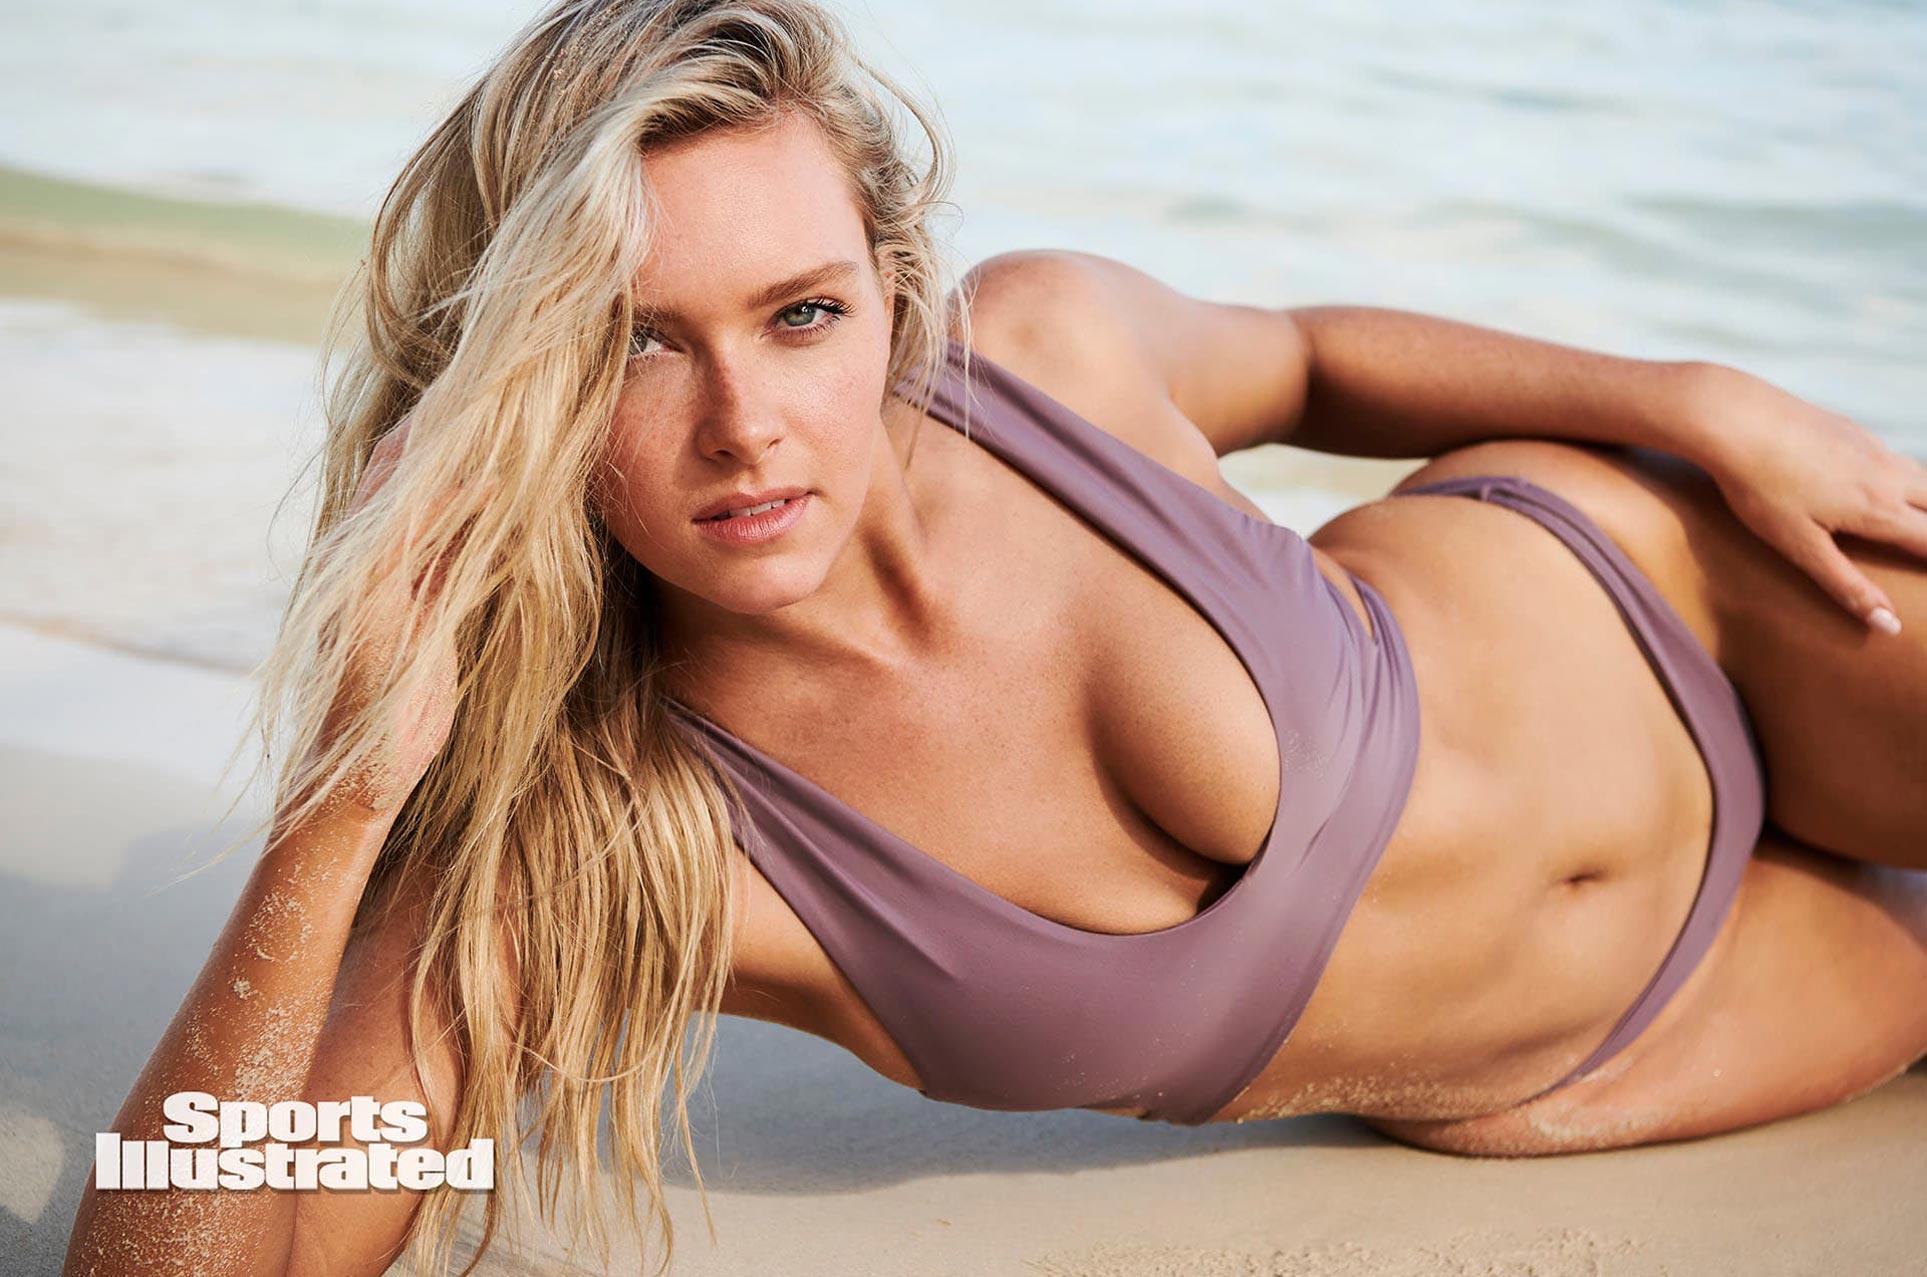 Камилла Костек в каталоге купальников Sports Illustrated Swimsuit 2020 / фото 11